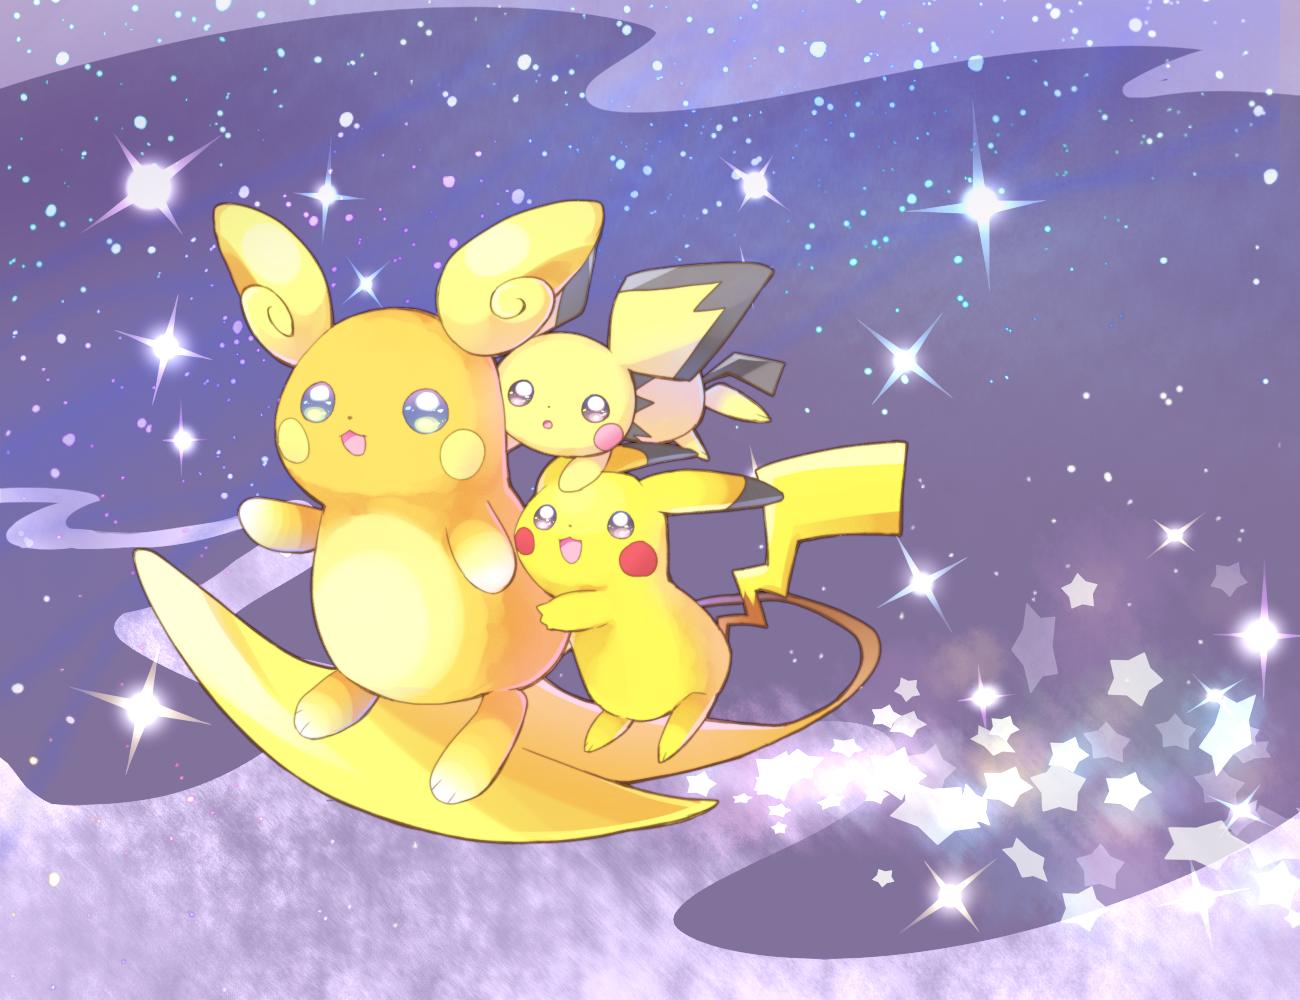 Pichu and Pikachu surfing with Alolan Raichu   Pokémon Sun ...Pichu Pikachu Raichu